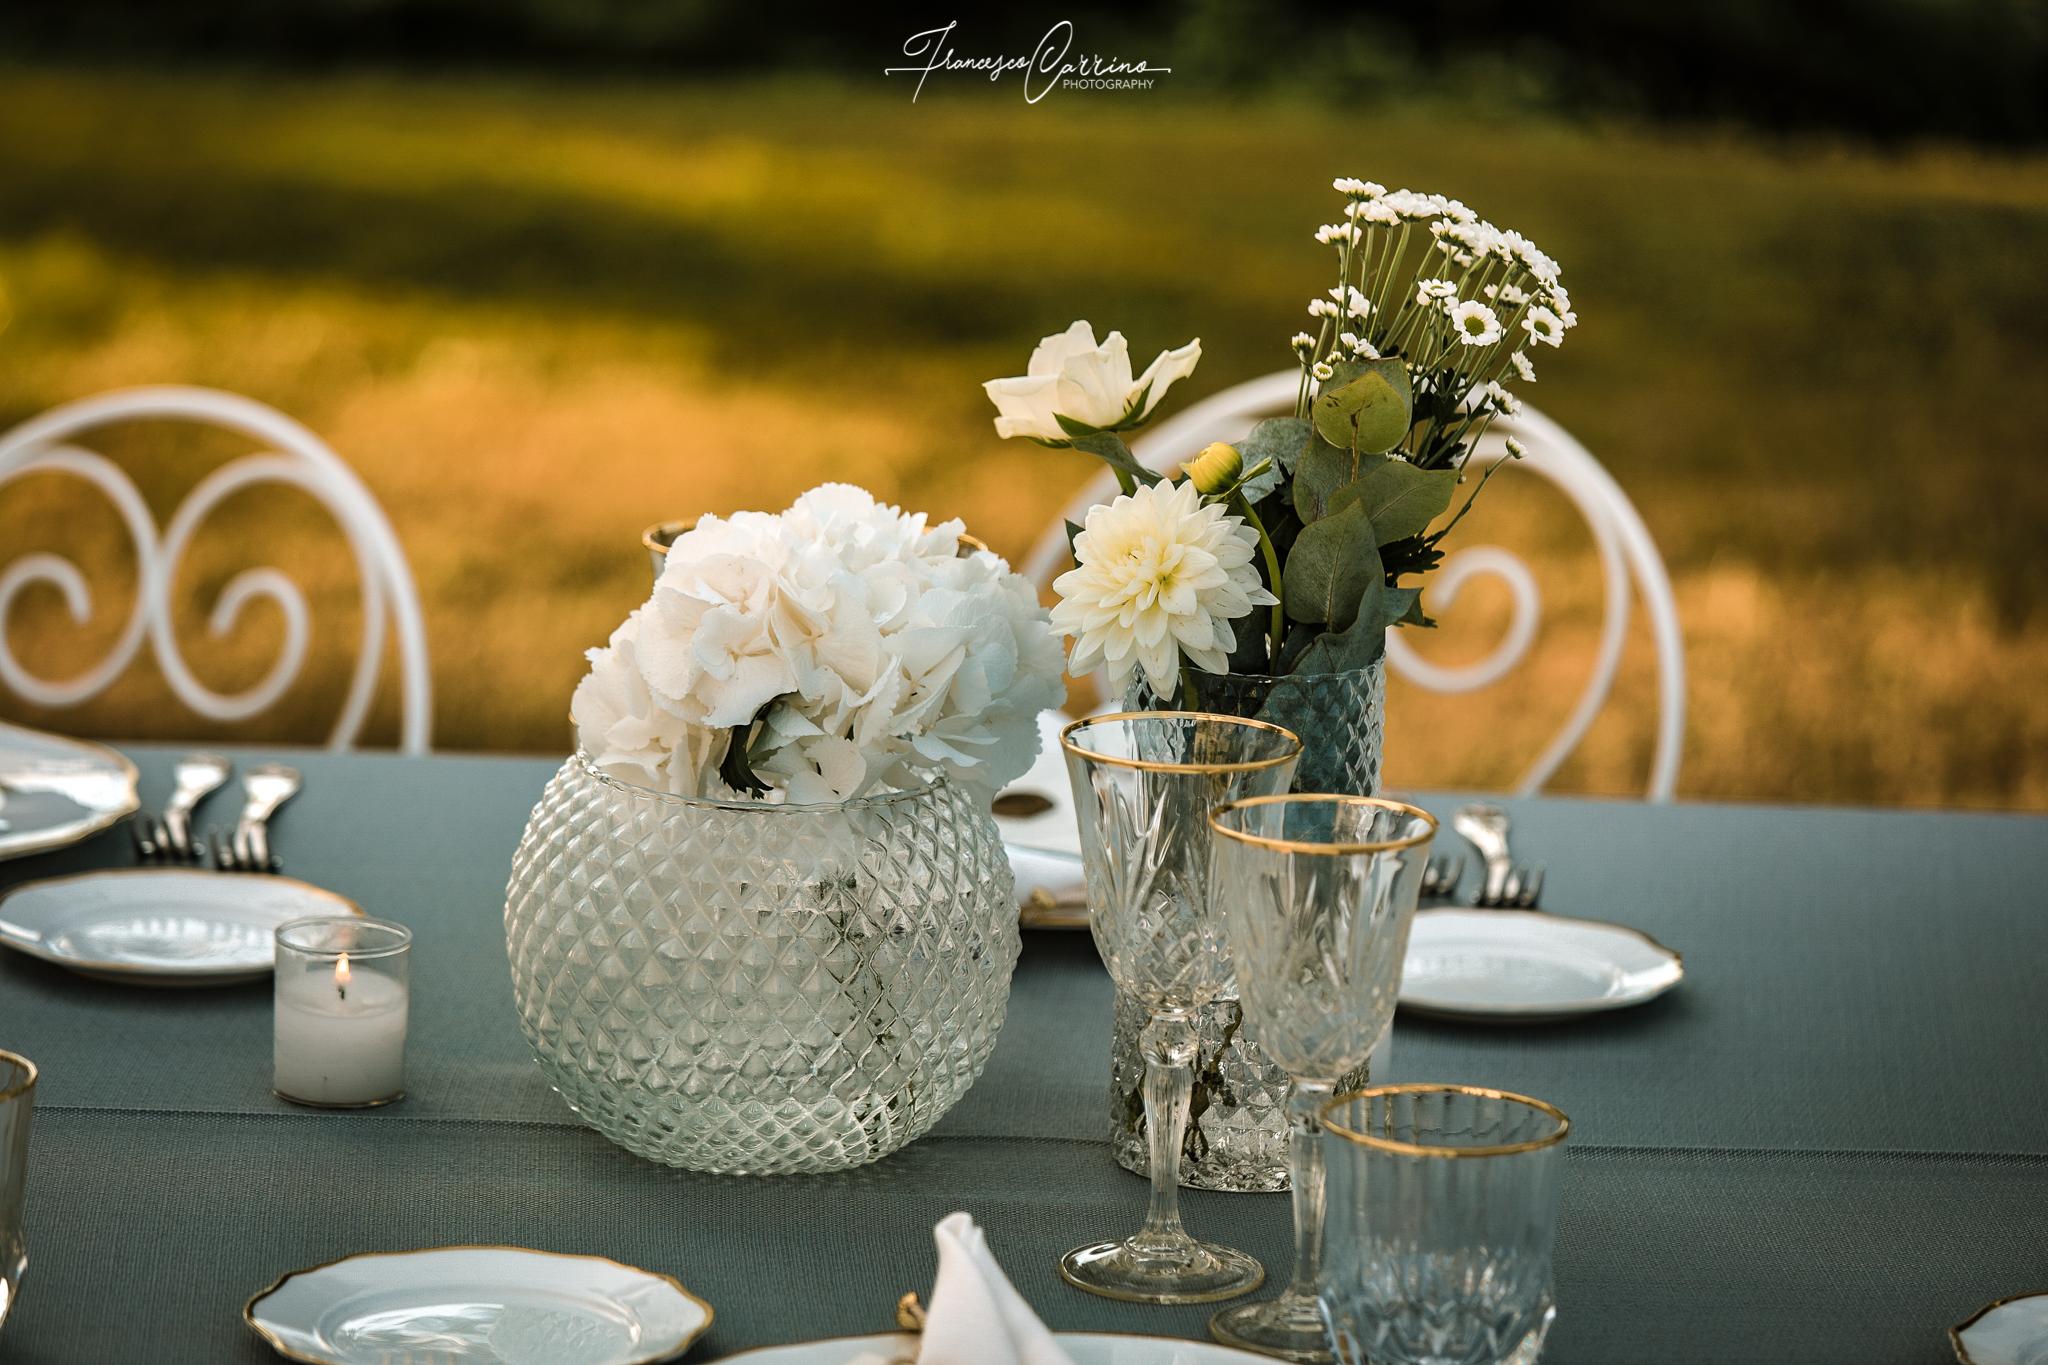 http://www.weddingamalfi.com/wp-content/uploads/Giannenza-13-luglio-2019-16.jpg